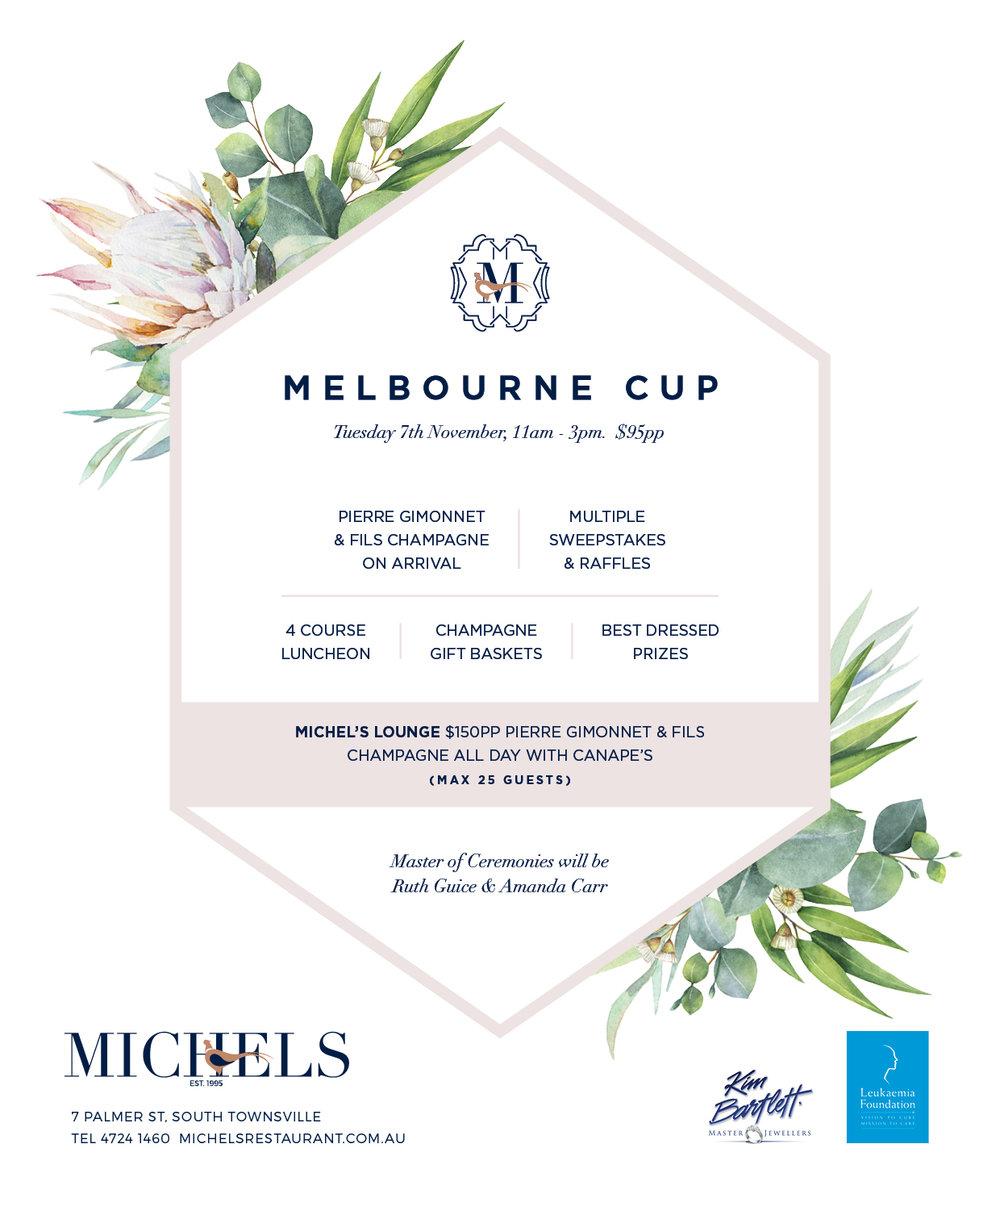 Michels Melbourne Cup Duo FP.jpg